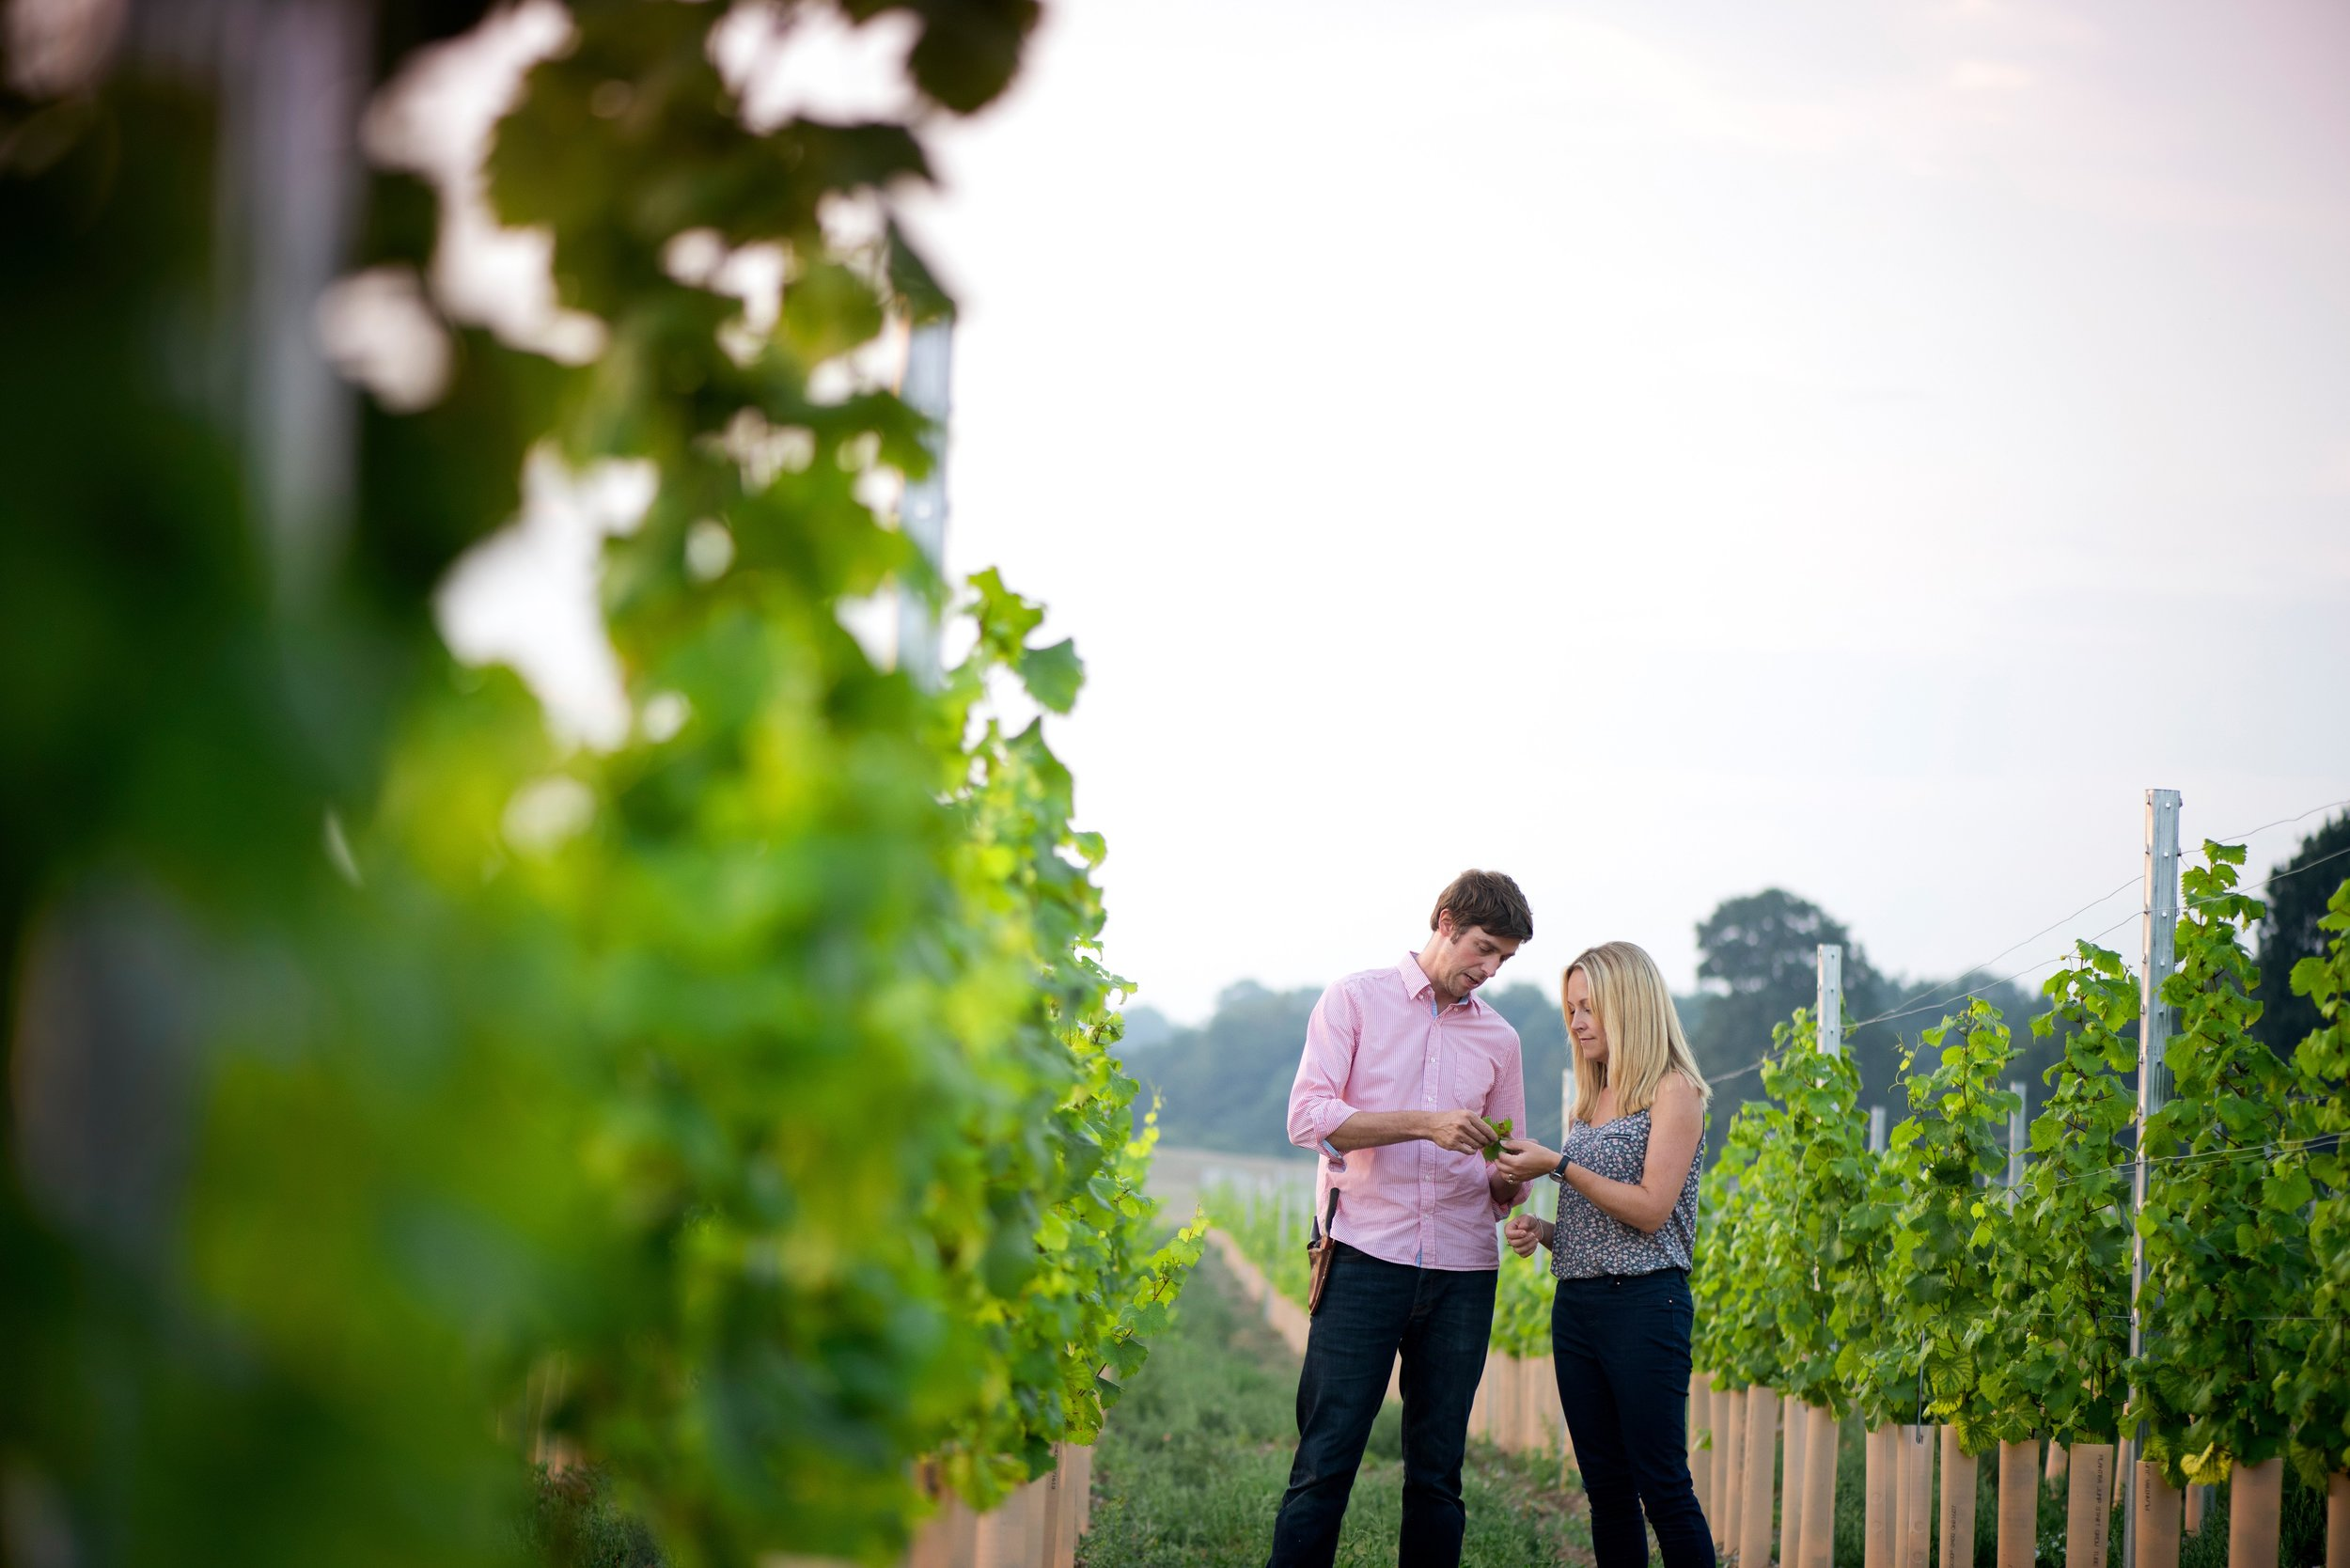 Flint Vineyard_Ben & Hannah Witchell in the vines.jpg